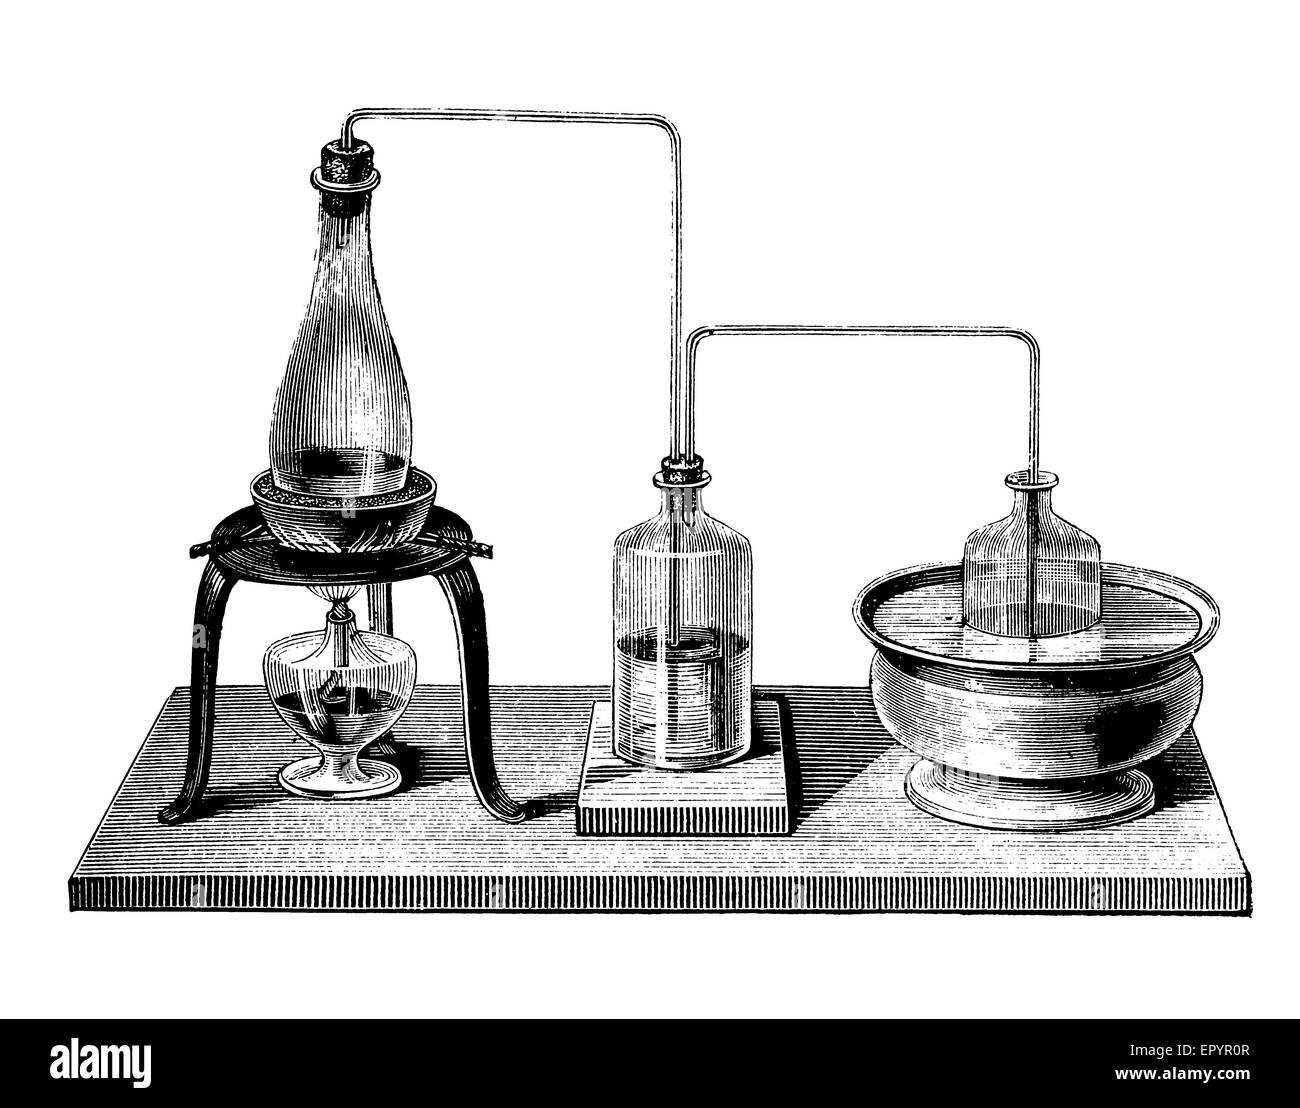 Engraving Alcohol Stockfotos & Engraving Alcohol Bilder - Seite 3 ...